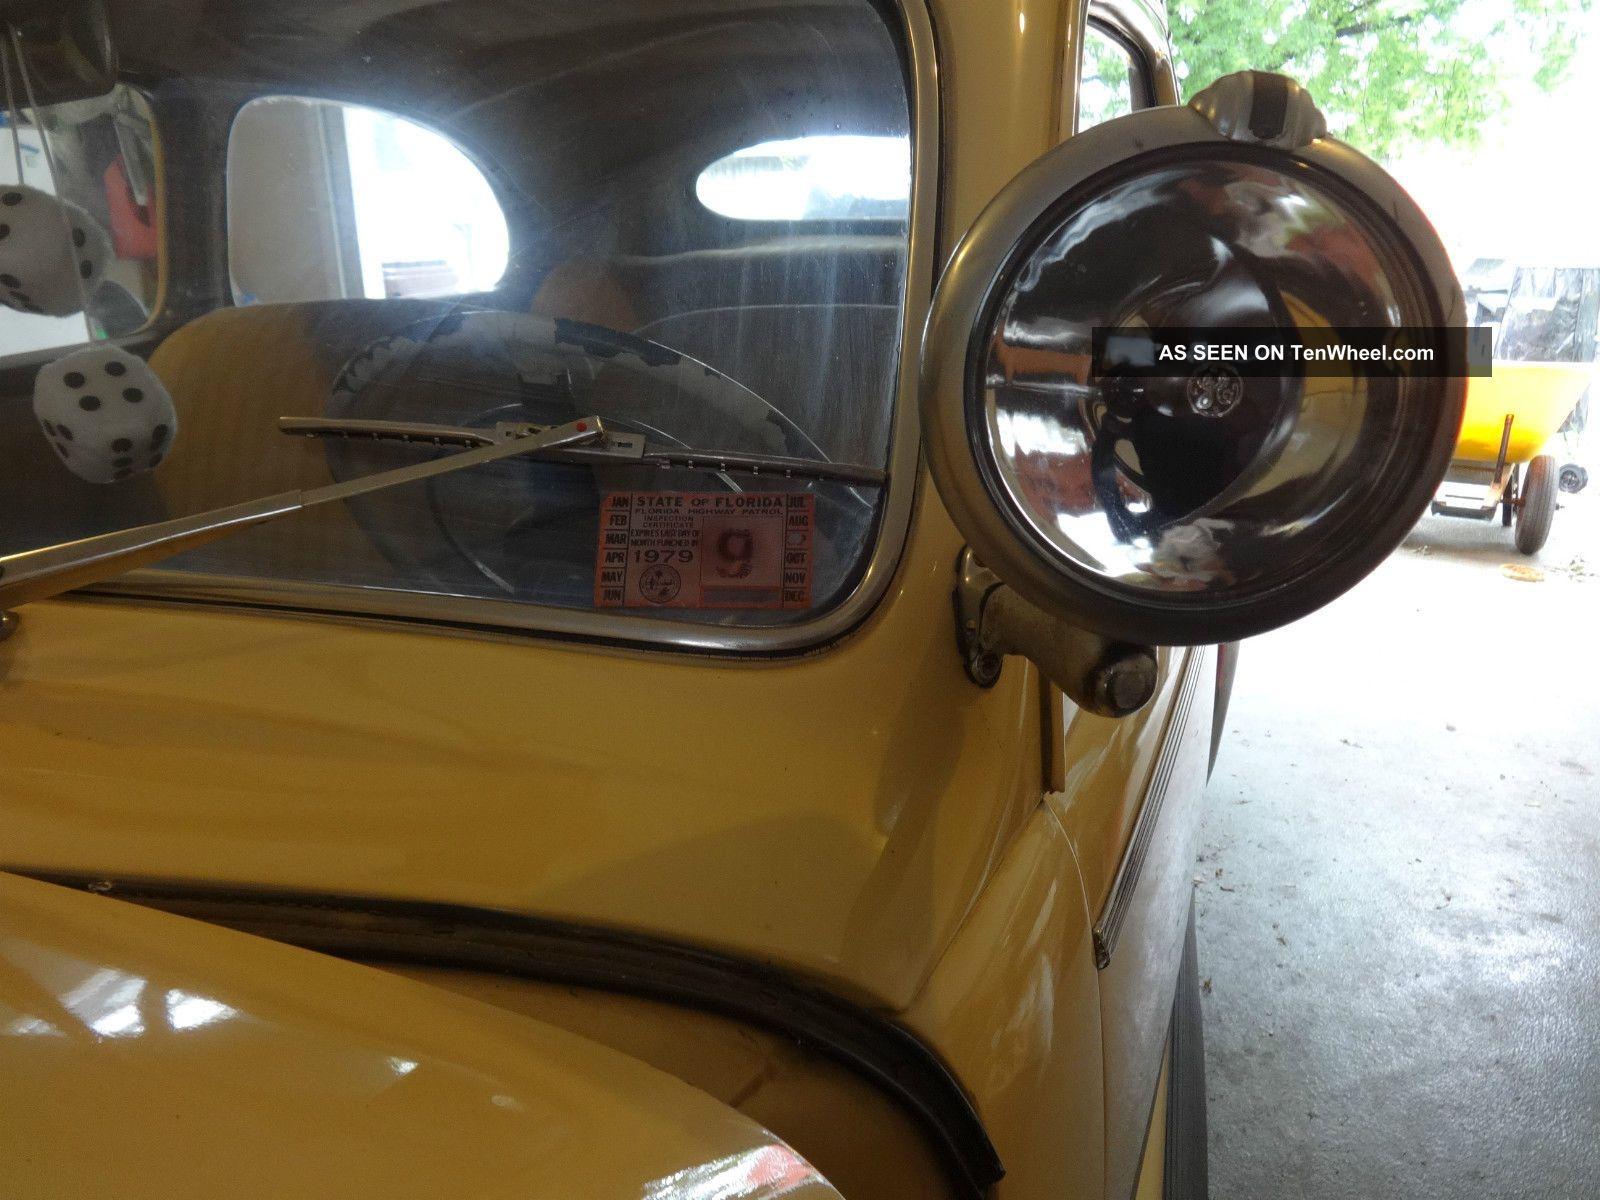 1941 Ford Deluxe 2 Door Sedan Flathead V8 Flatty Hot Rod Cruiser Mercury Engine Potentiol Other Photo 19